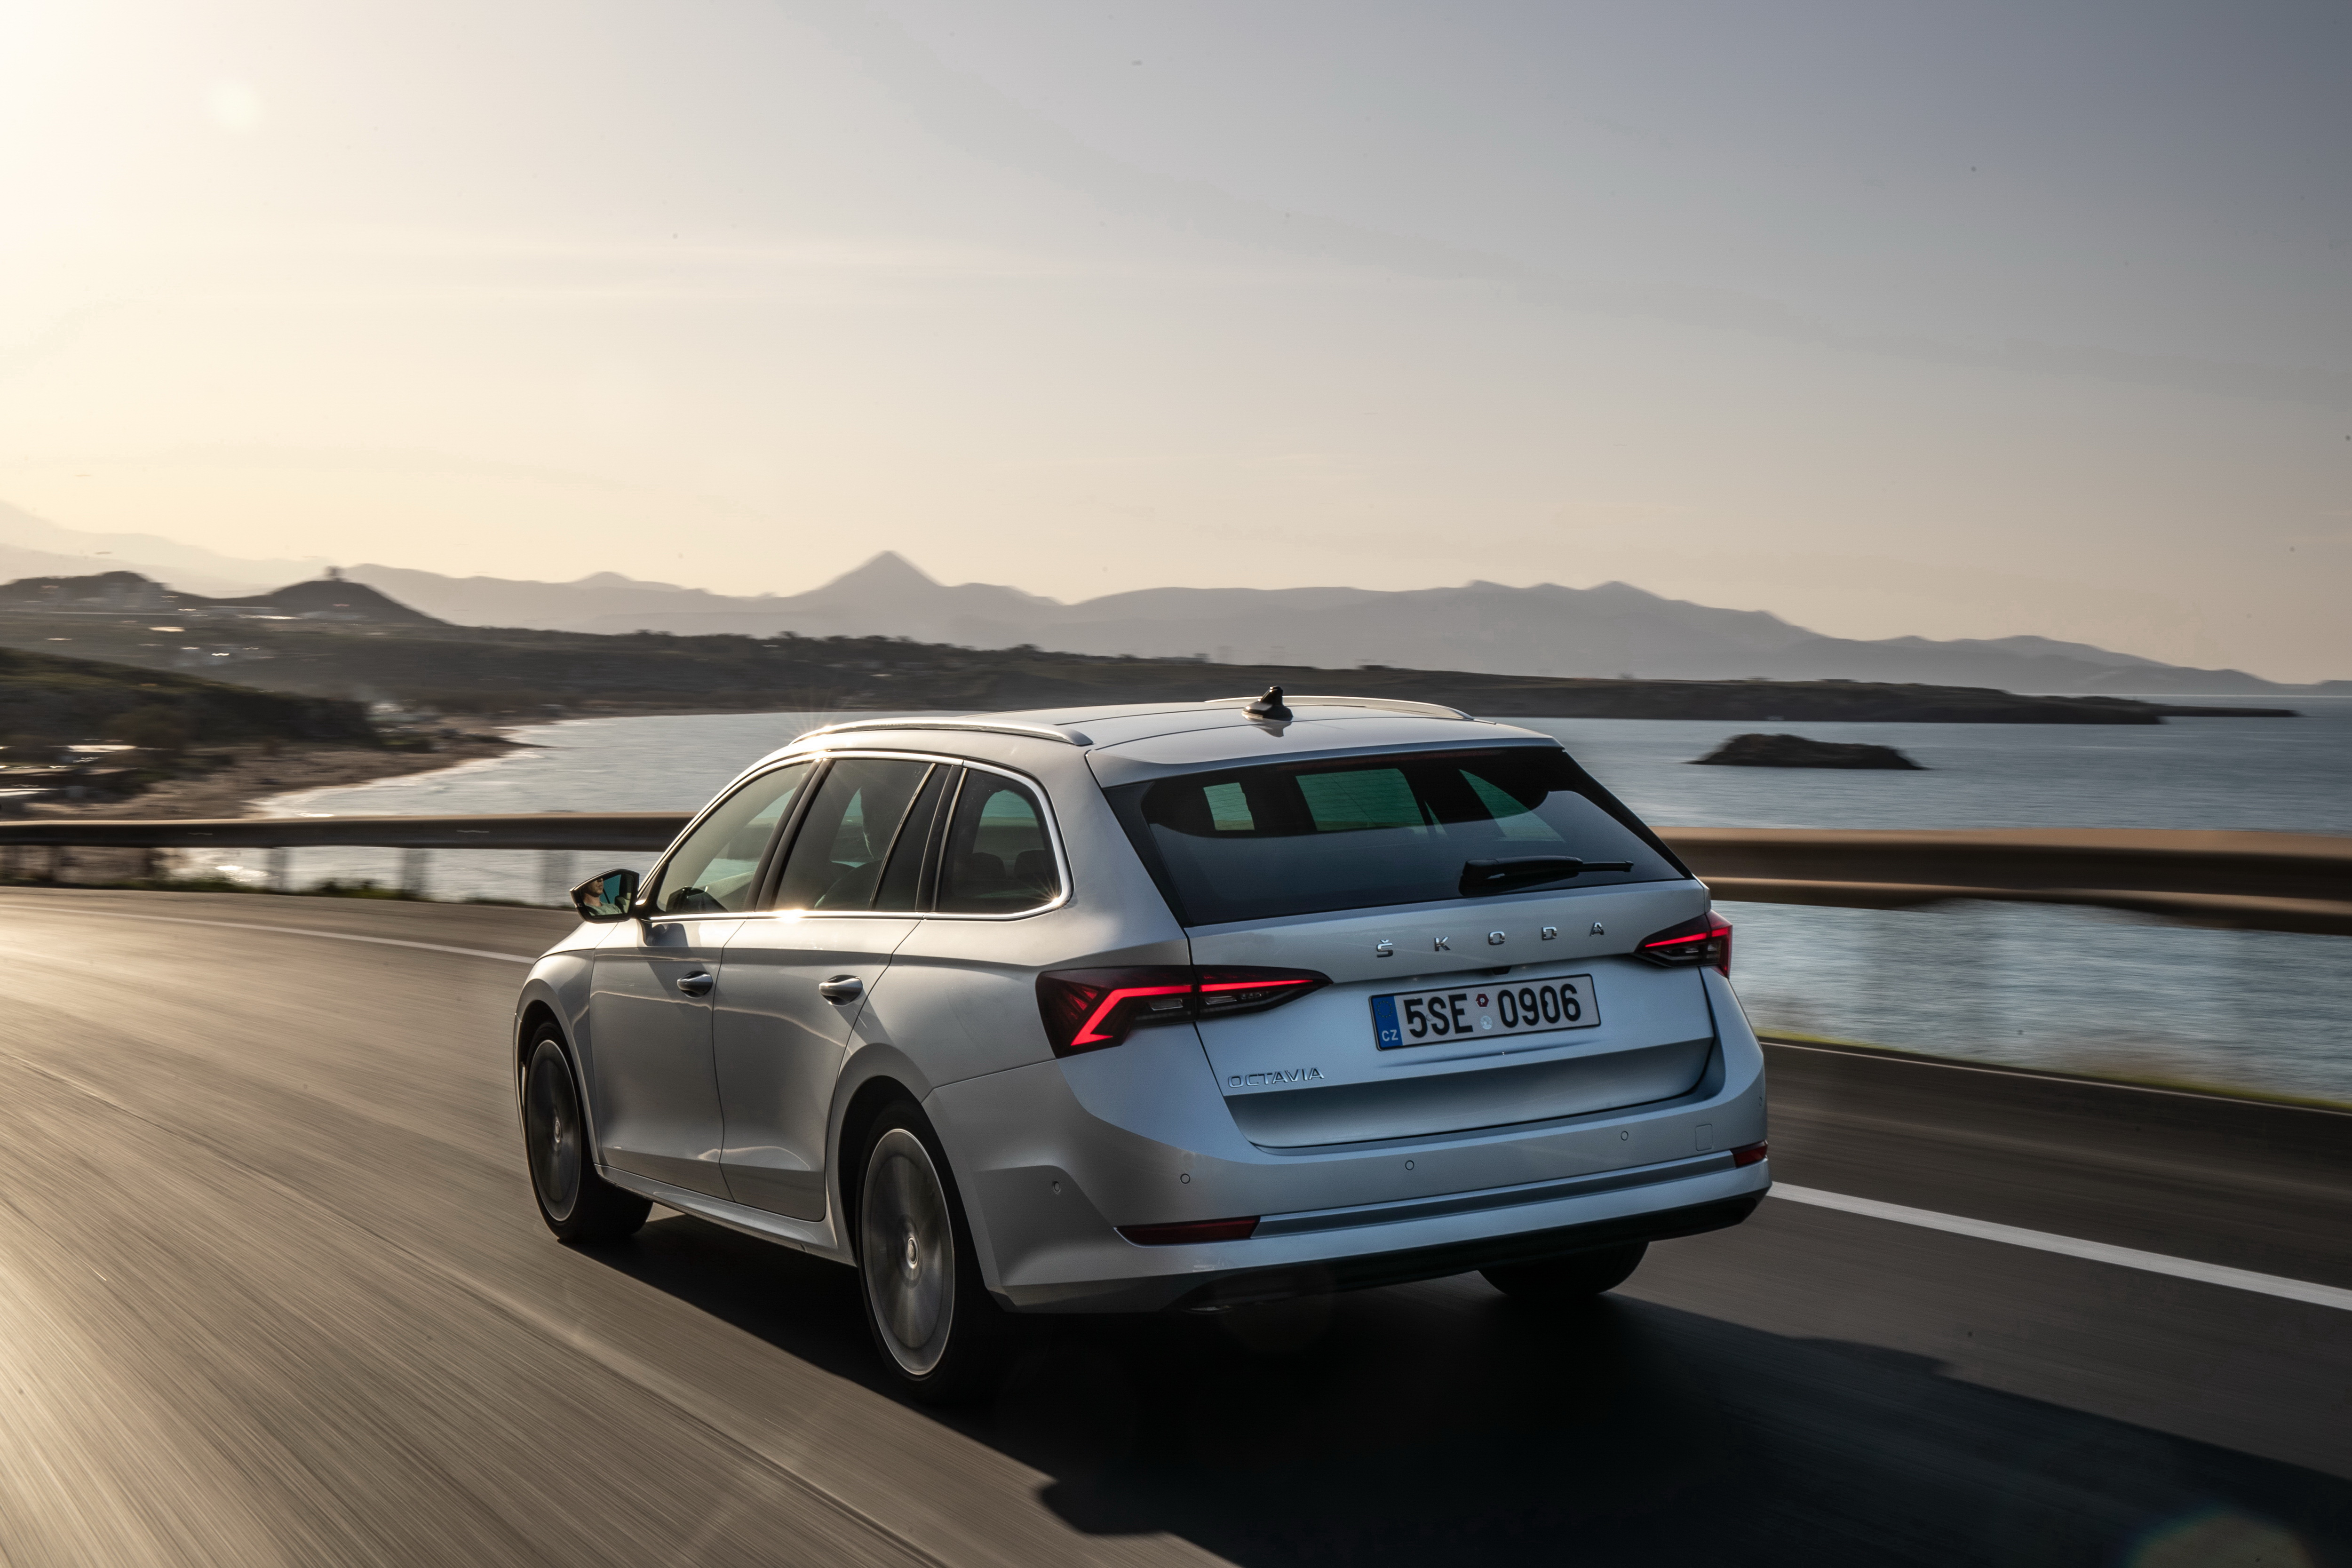 SKODA wins six 'Family Car of the Year' awards in AUTO Straßenverkehr readers' choice - Image 2